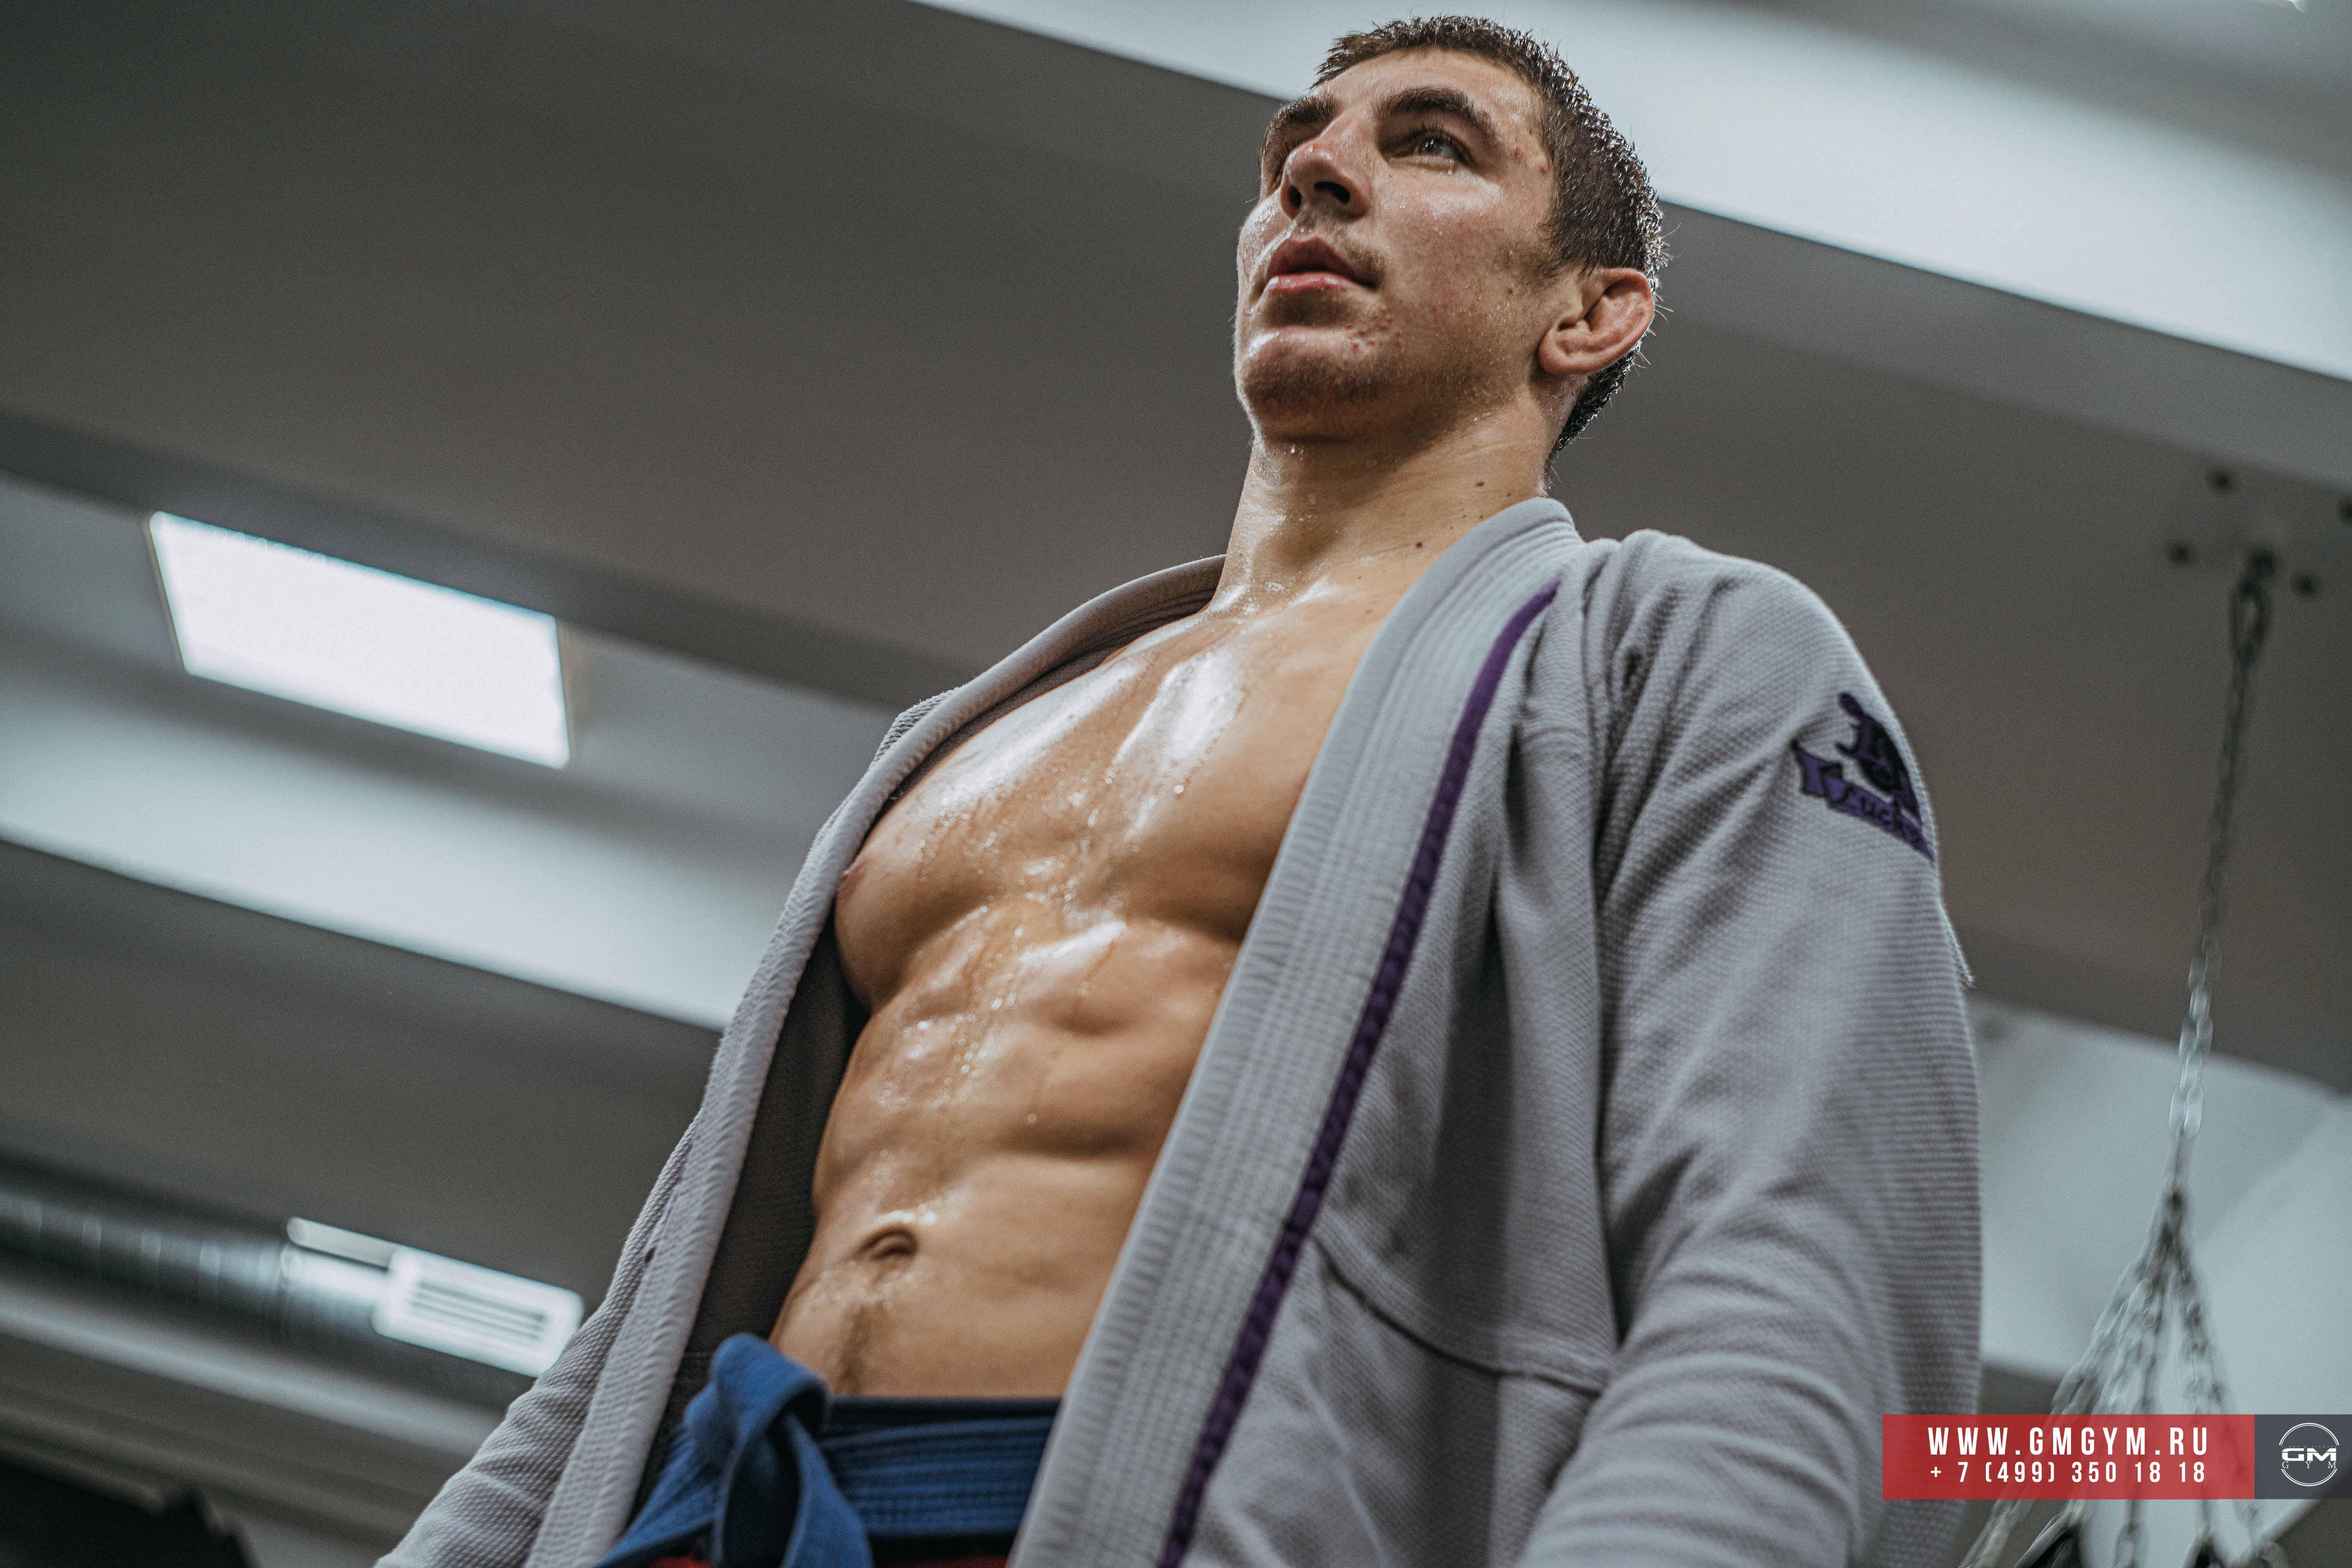 Виталий Слипенко тренер по ММА 2